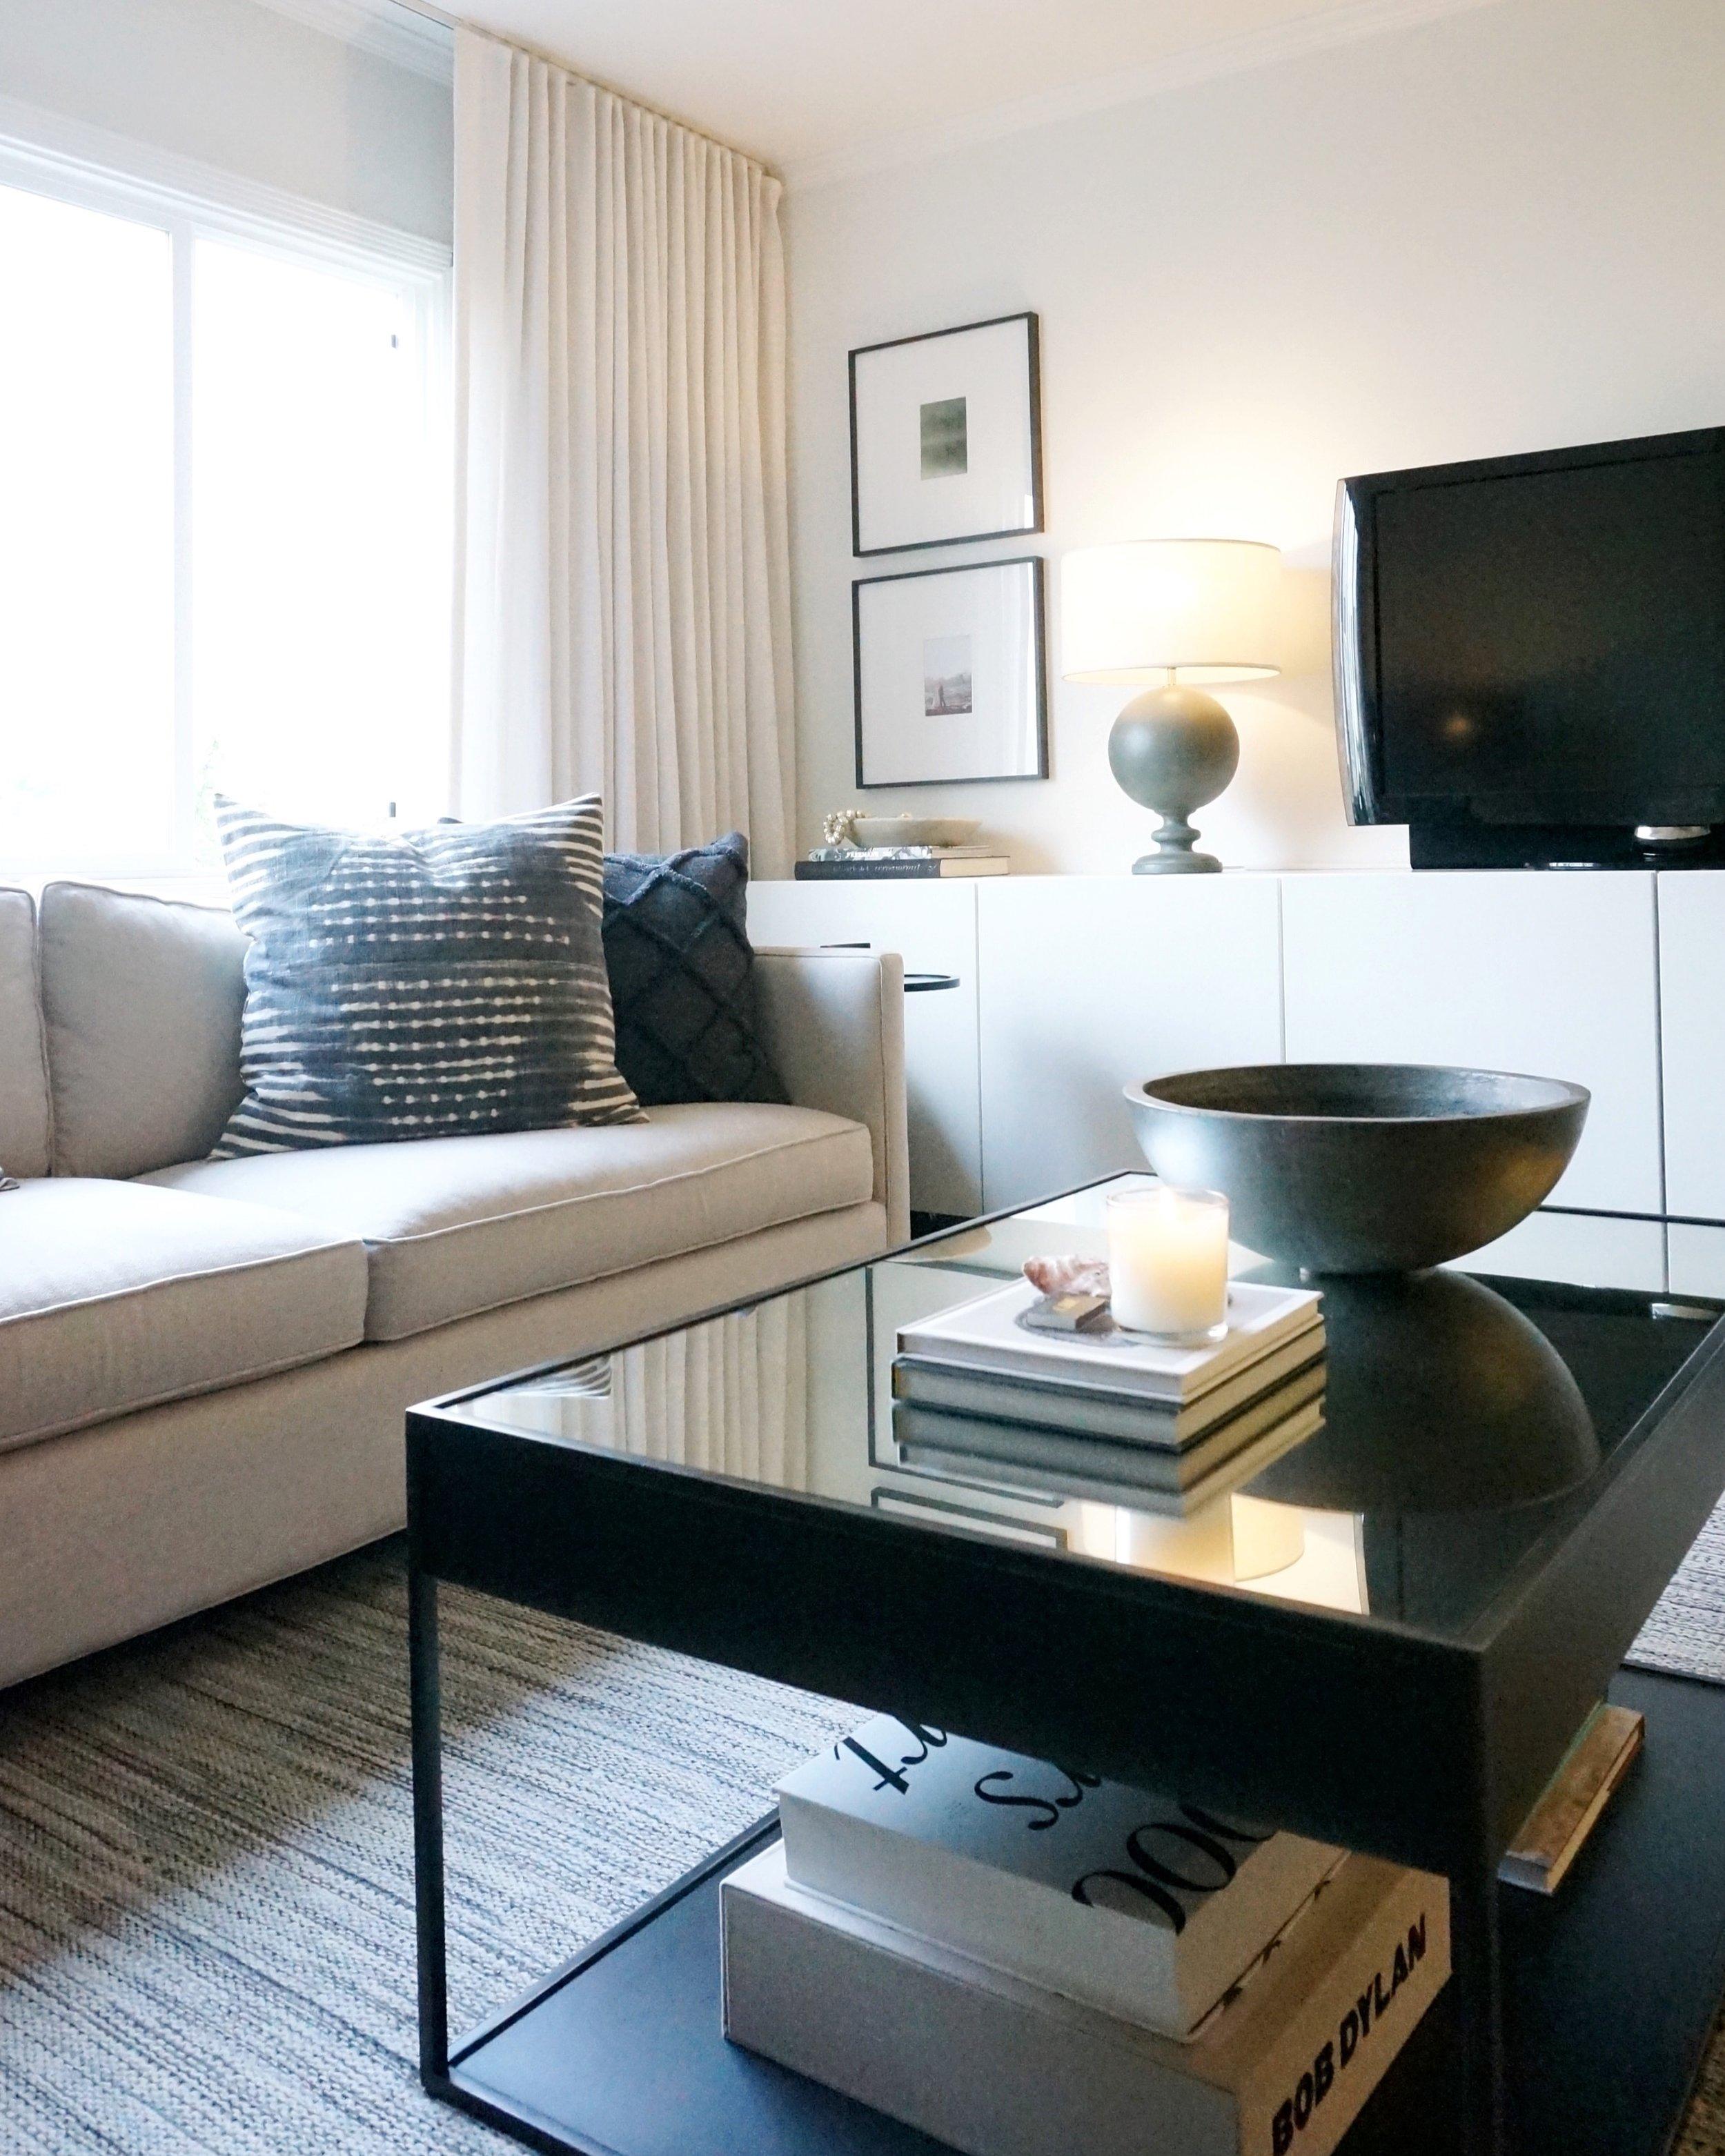 Apartment-17-Living-Room-1.jpg